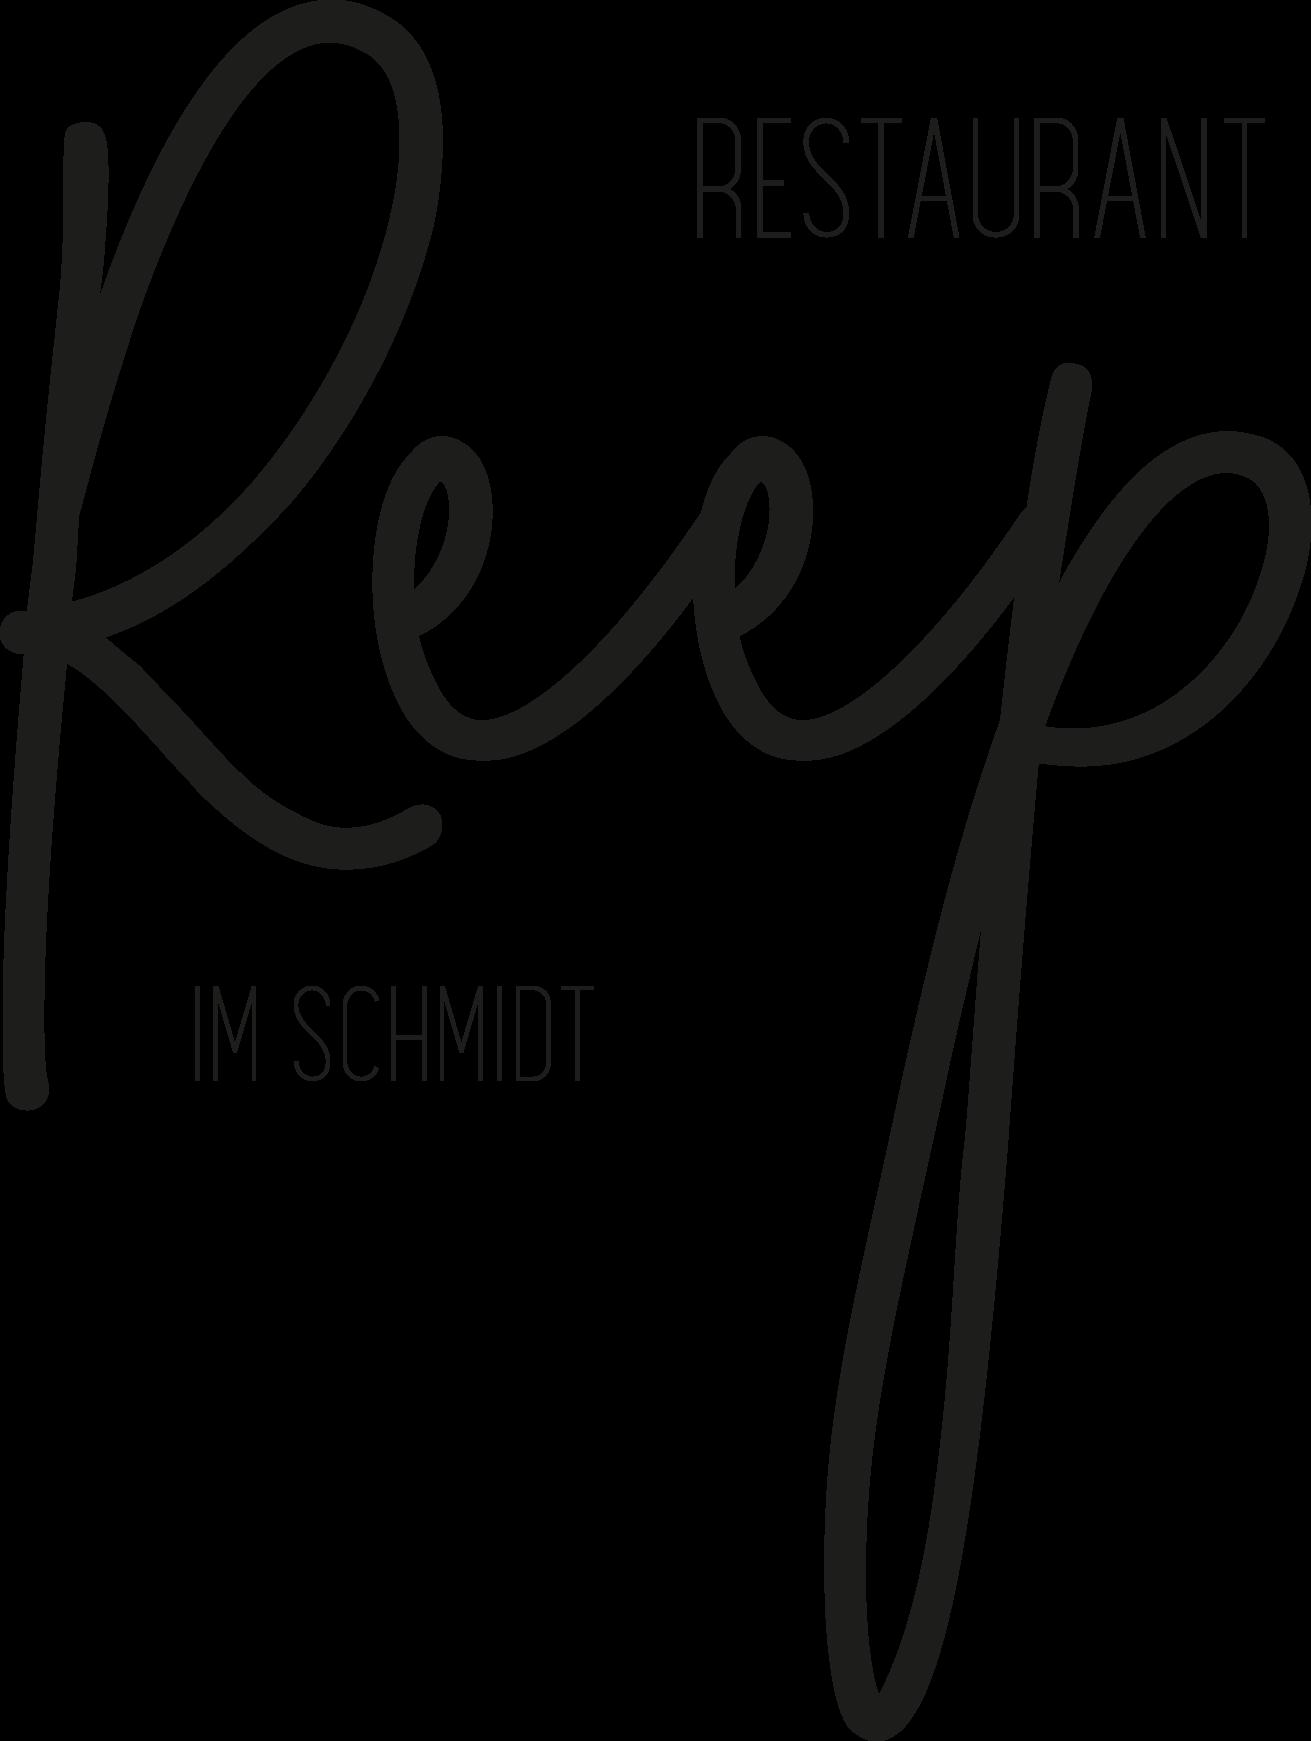 Reep - Restaurant im Schmidt Theater